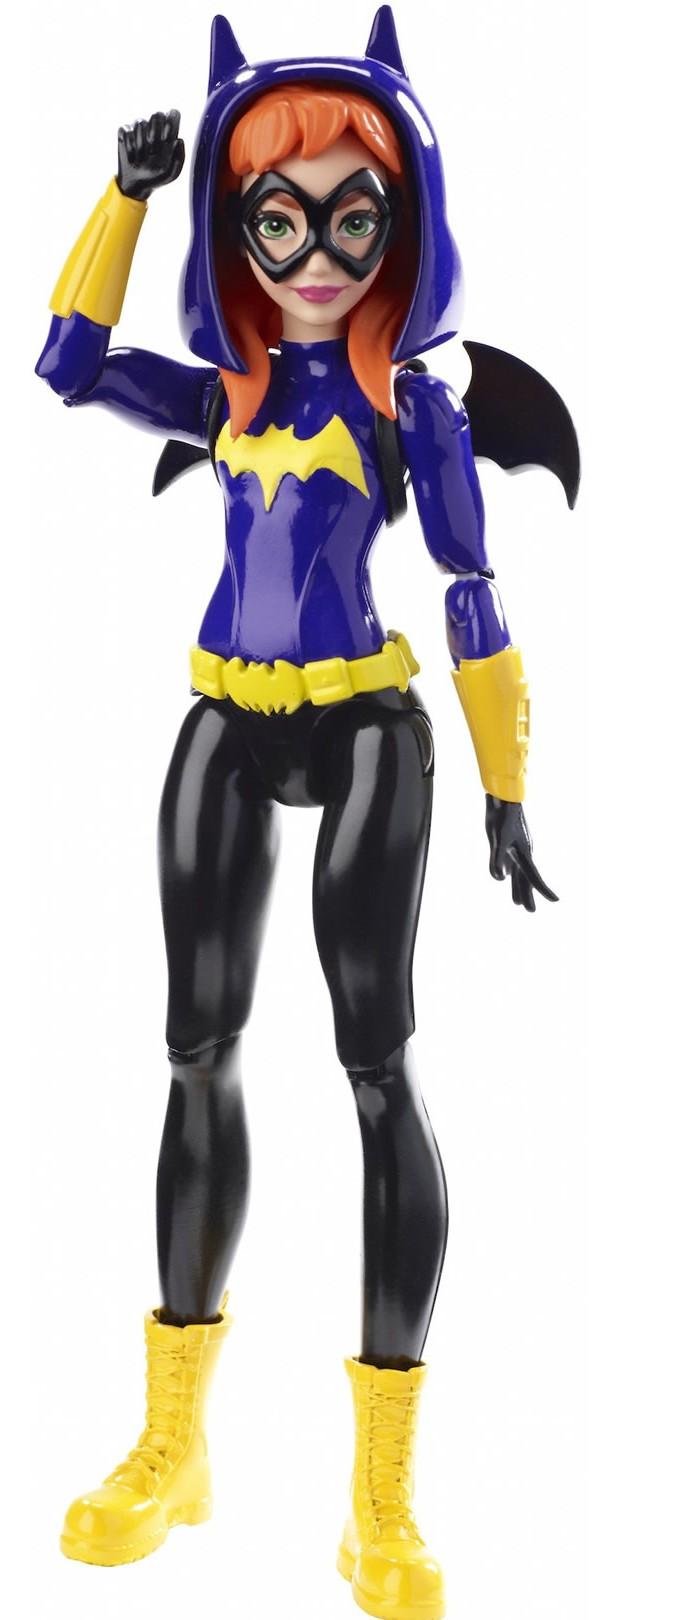 Super Hero High - Página 2 4998110